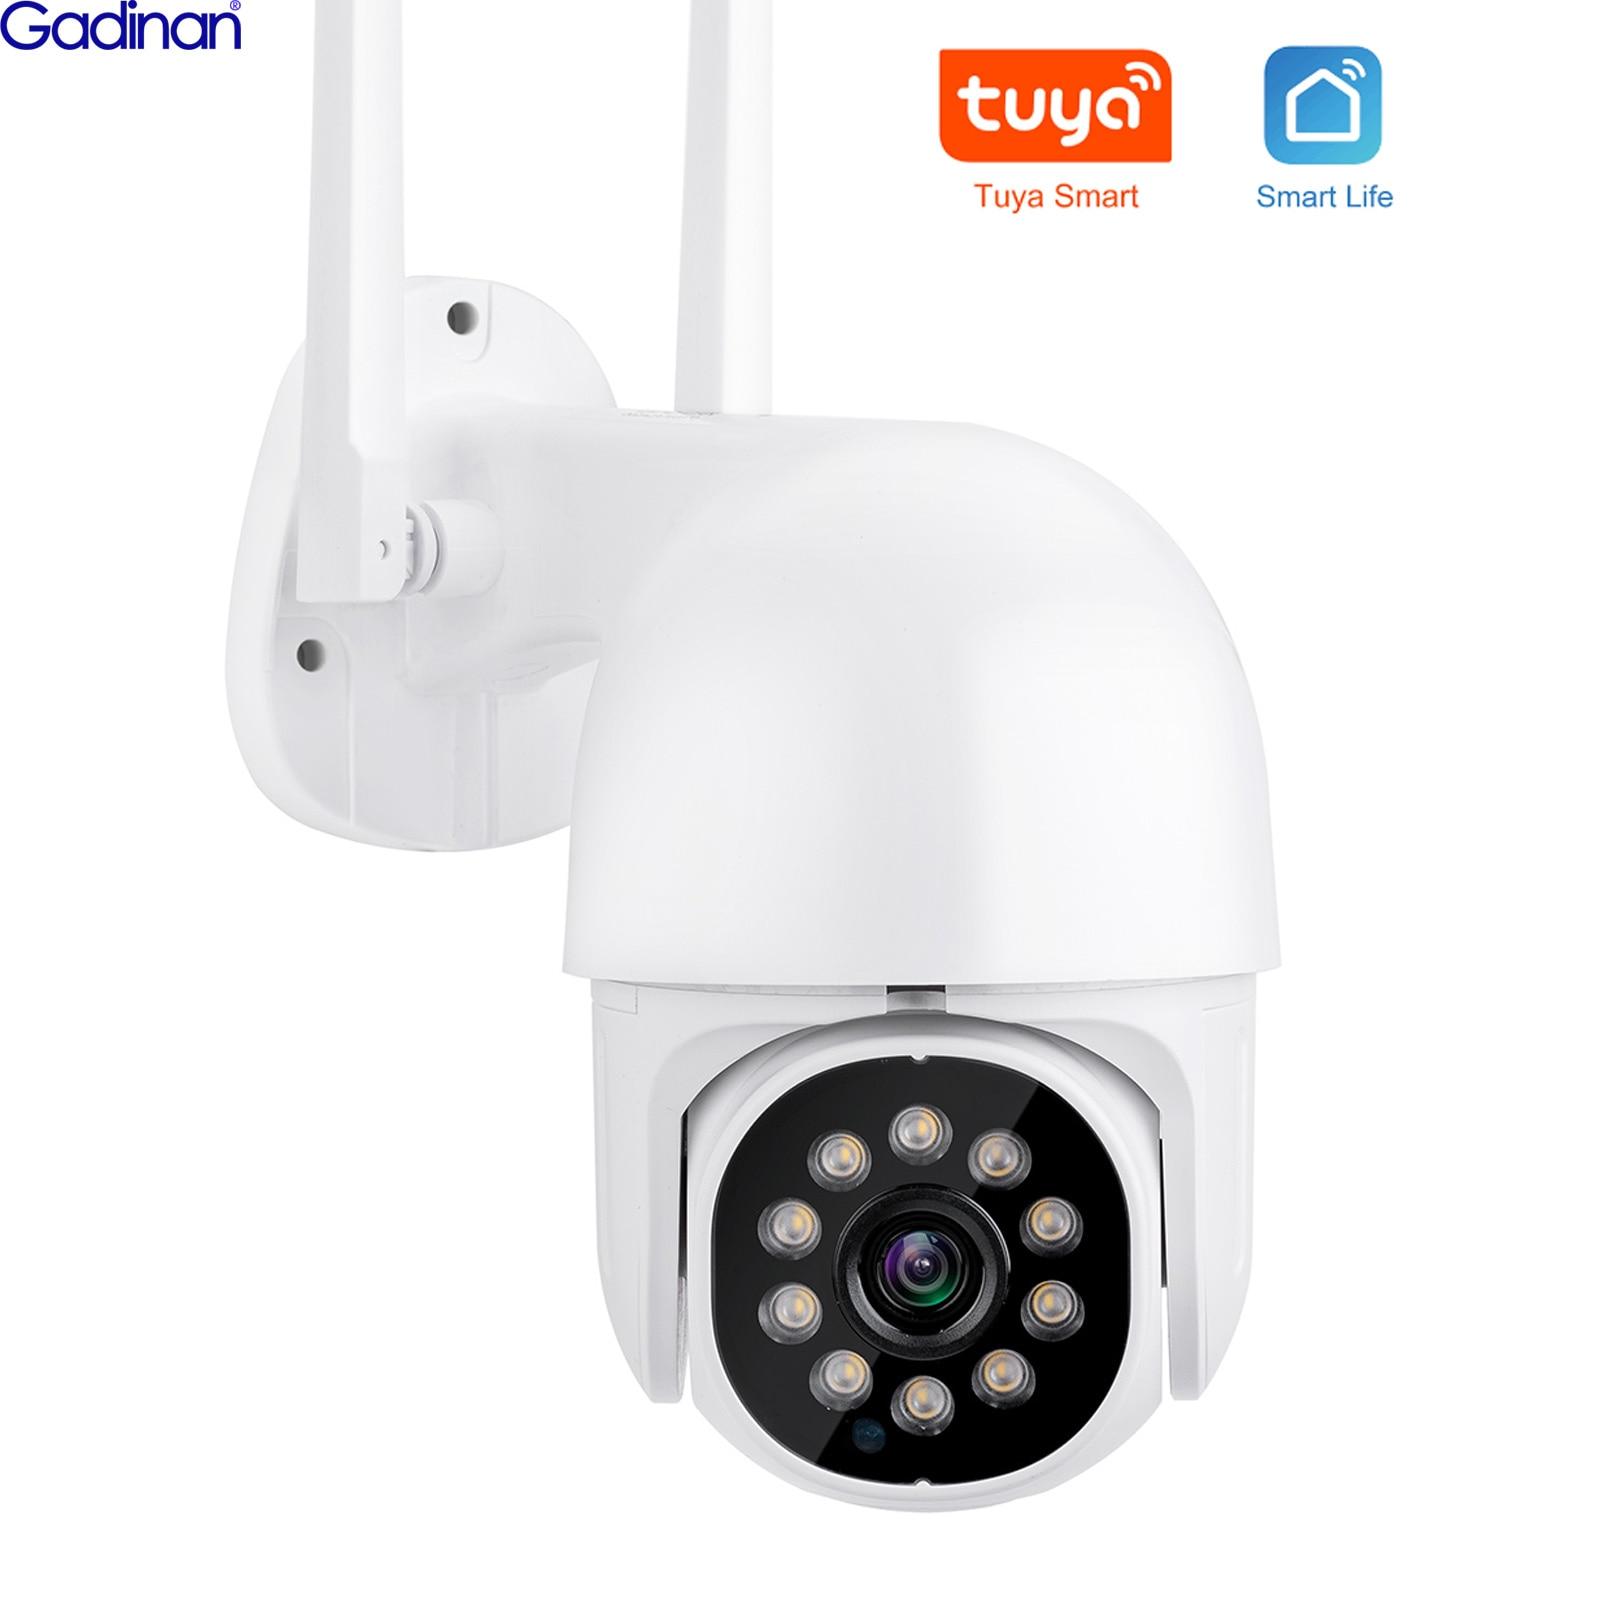 Gadinan 5MP PTZ IP Camera WiFi Tuya Smart Life Home 4x Zoom AI Human Auto-Tracking IR/Color Night Vi